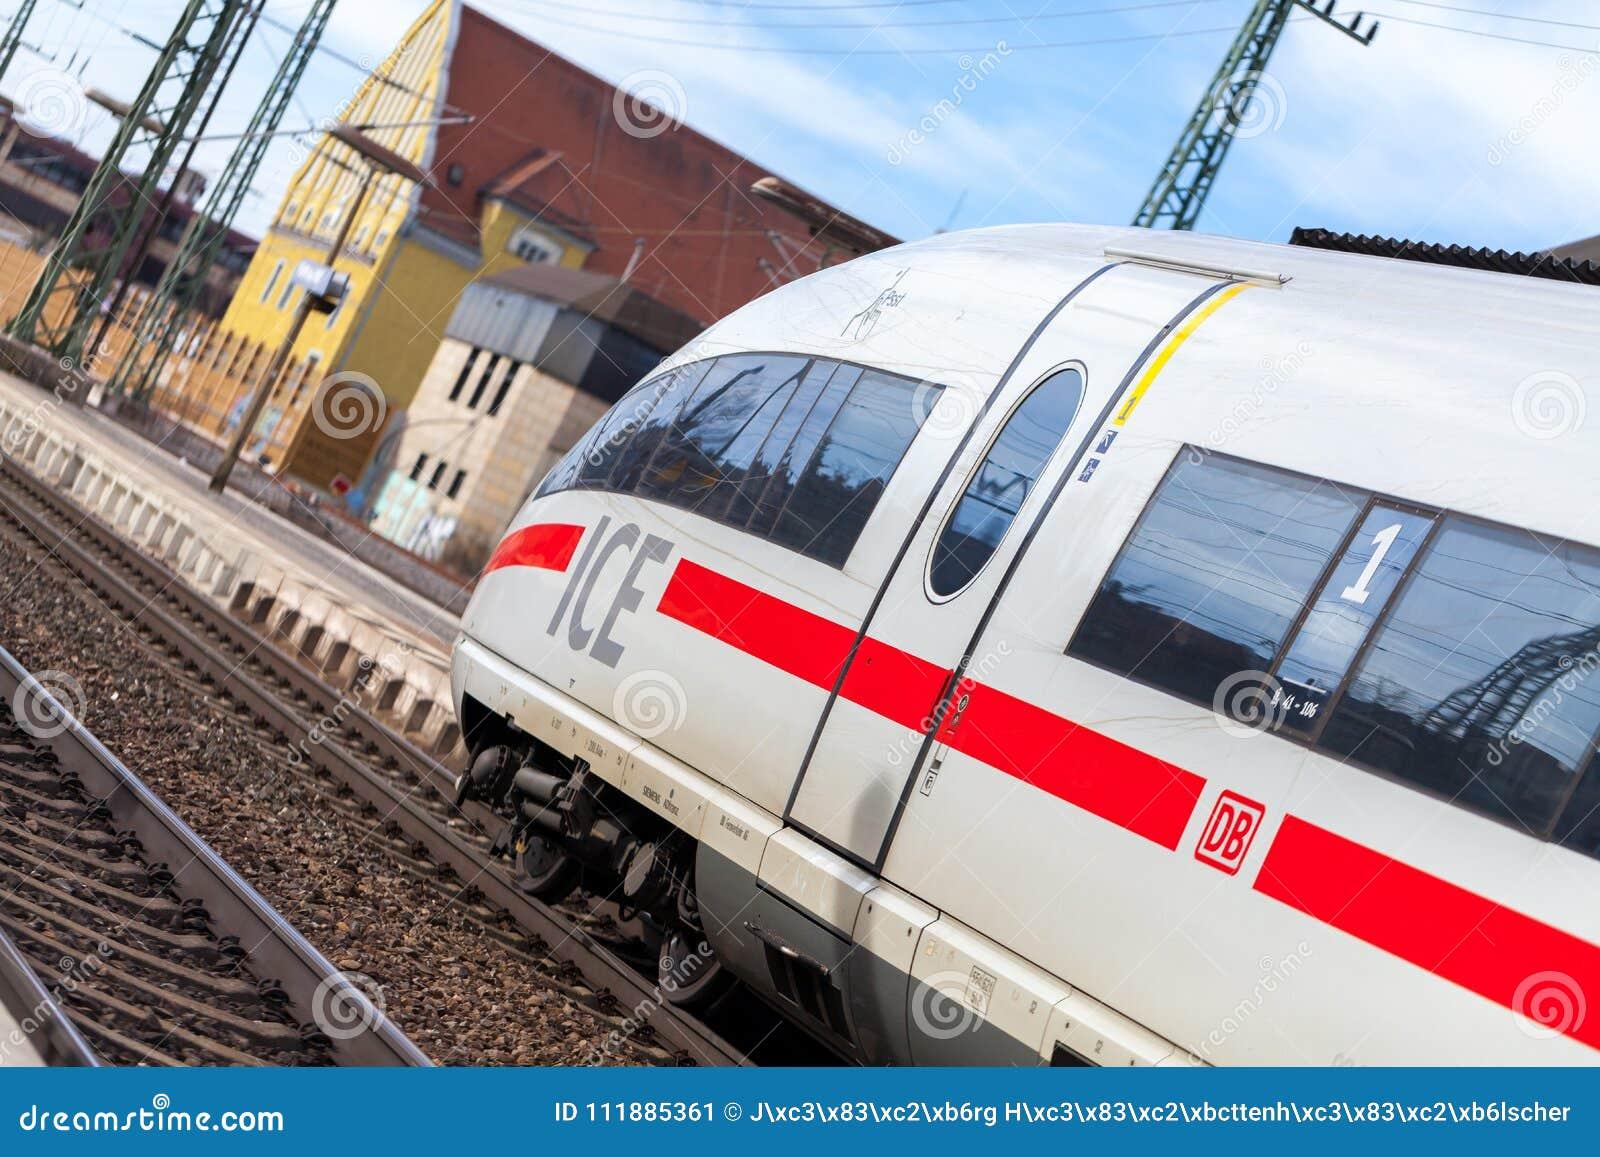 https://thumbs.dreamstime.com/z/ice-intercity-express-train-deutsche-bahn-passes-train-station-fuerth-germany-march-ice-intercity-express-train-deutsche-111885361.jpg